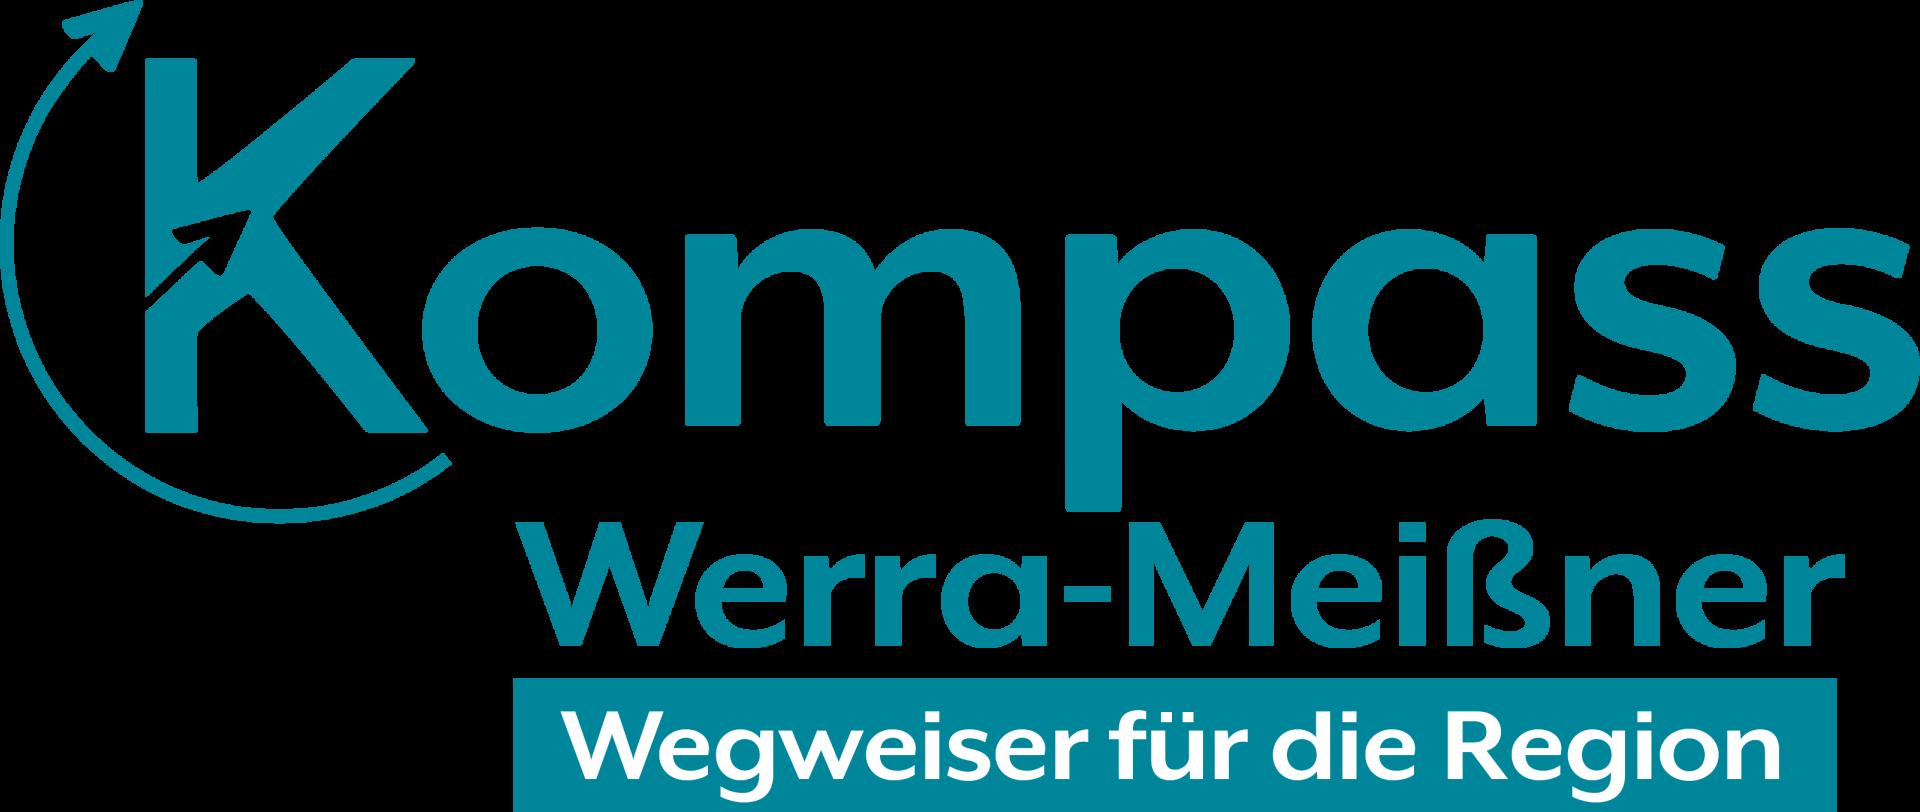 Kompass Werra-Meißner